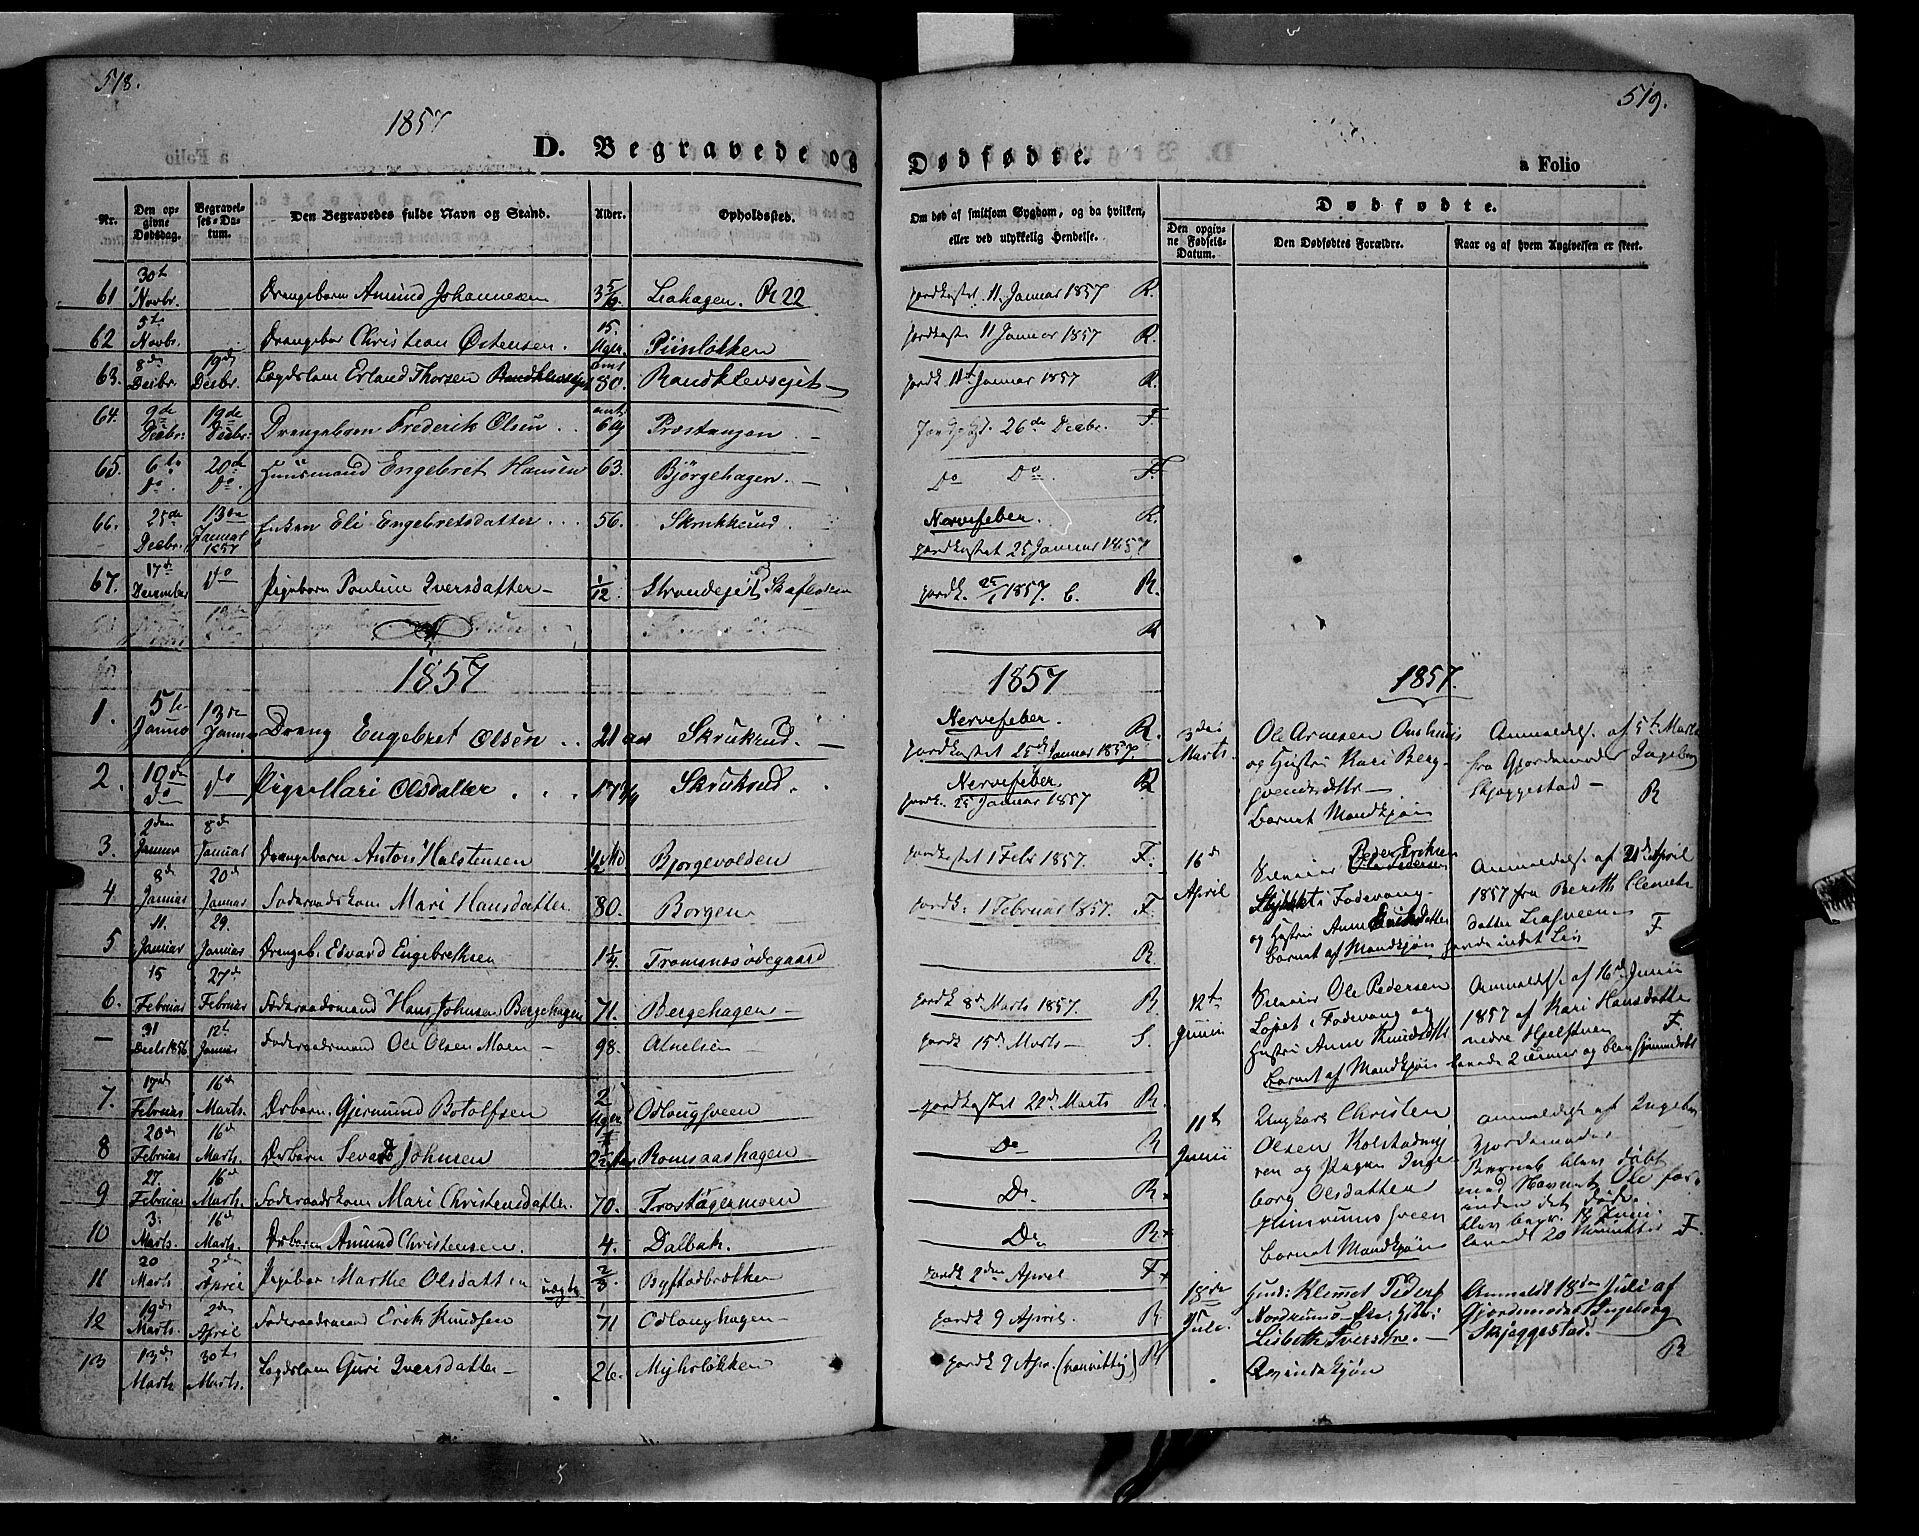 SAH, Ringebu prestekontor, Ministerialbok nr. 6, 1848-1859, s. 518-519